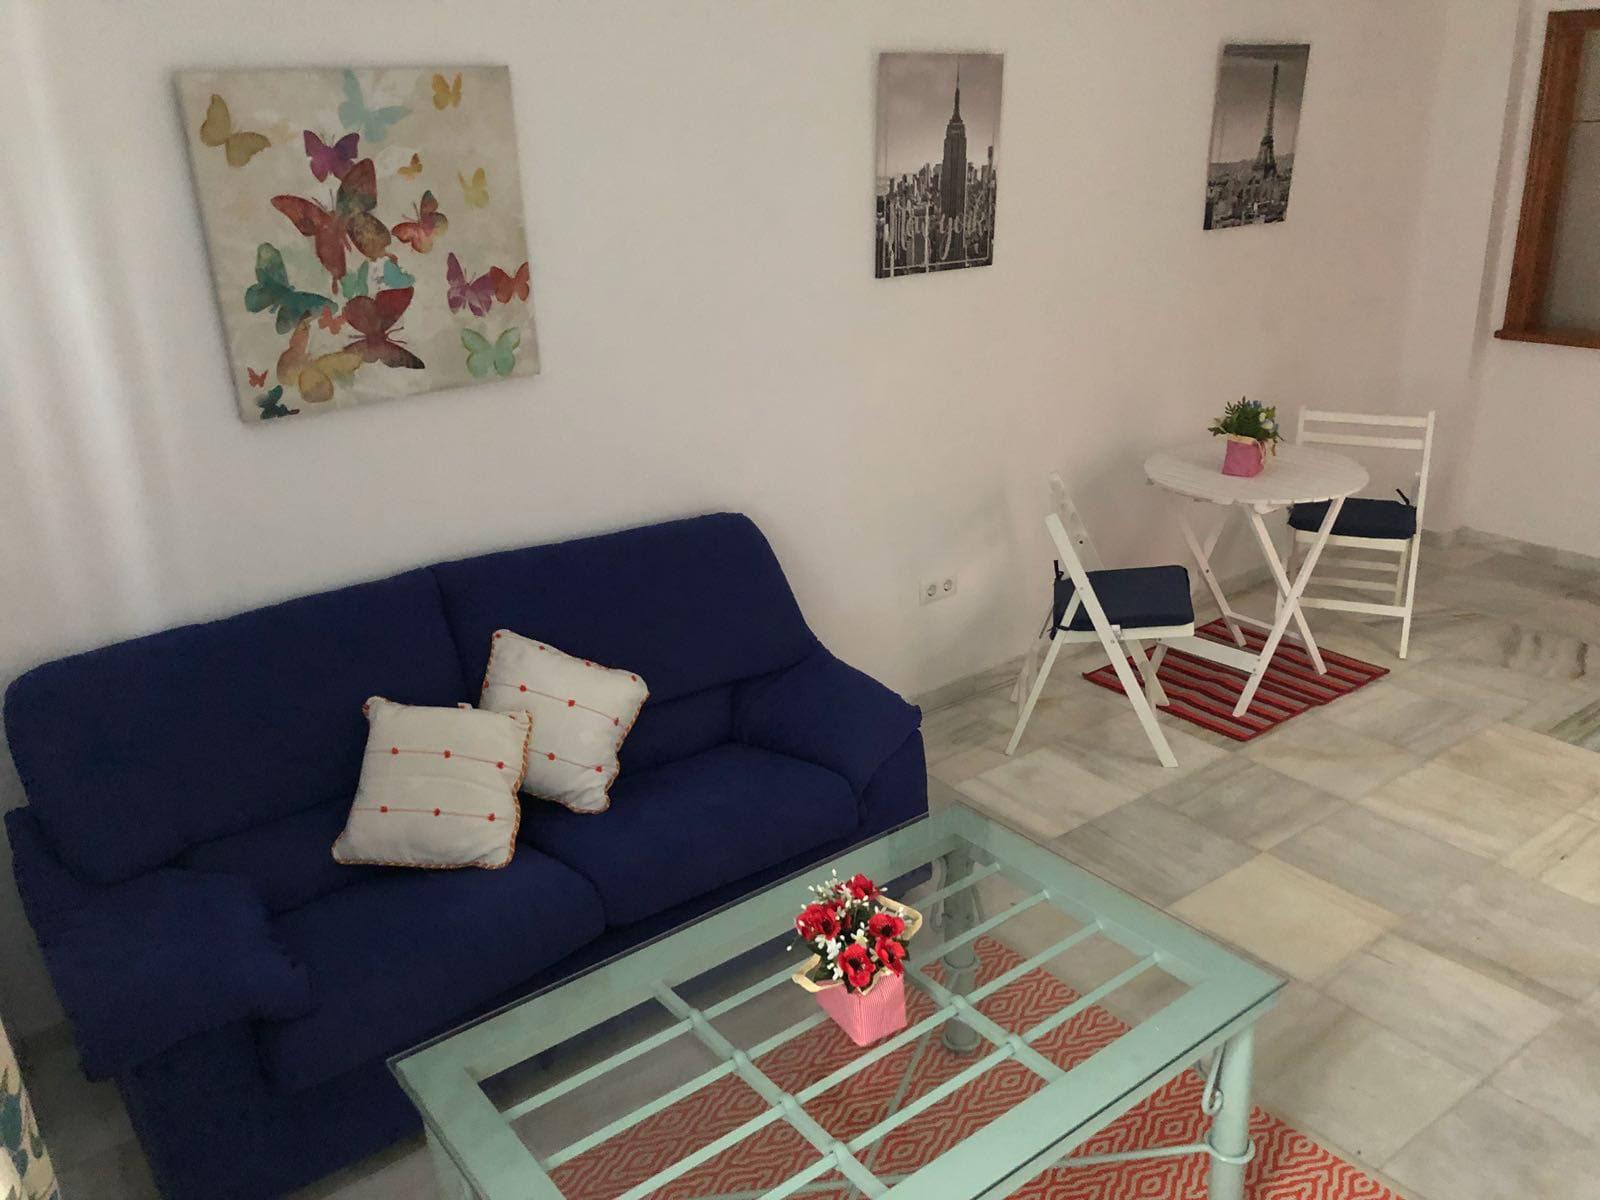 Alojamiento Para Grupos Grandes En Jerez Despedida Soltera Jerez